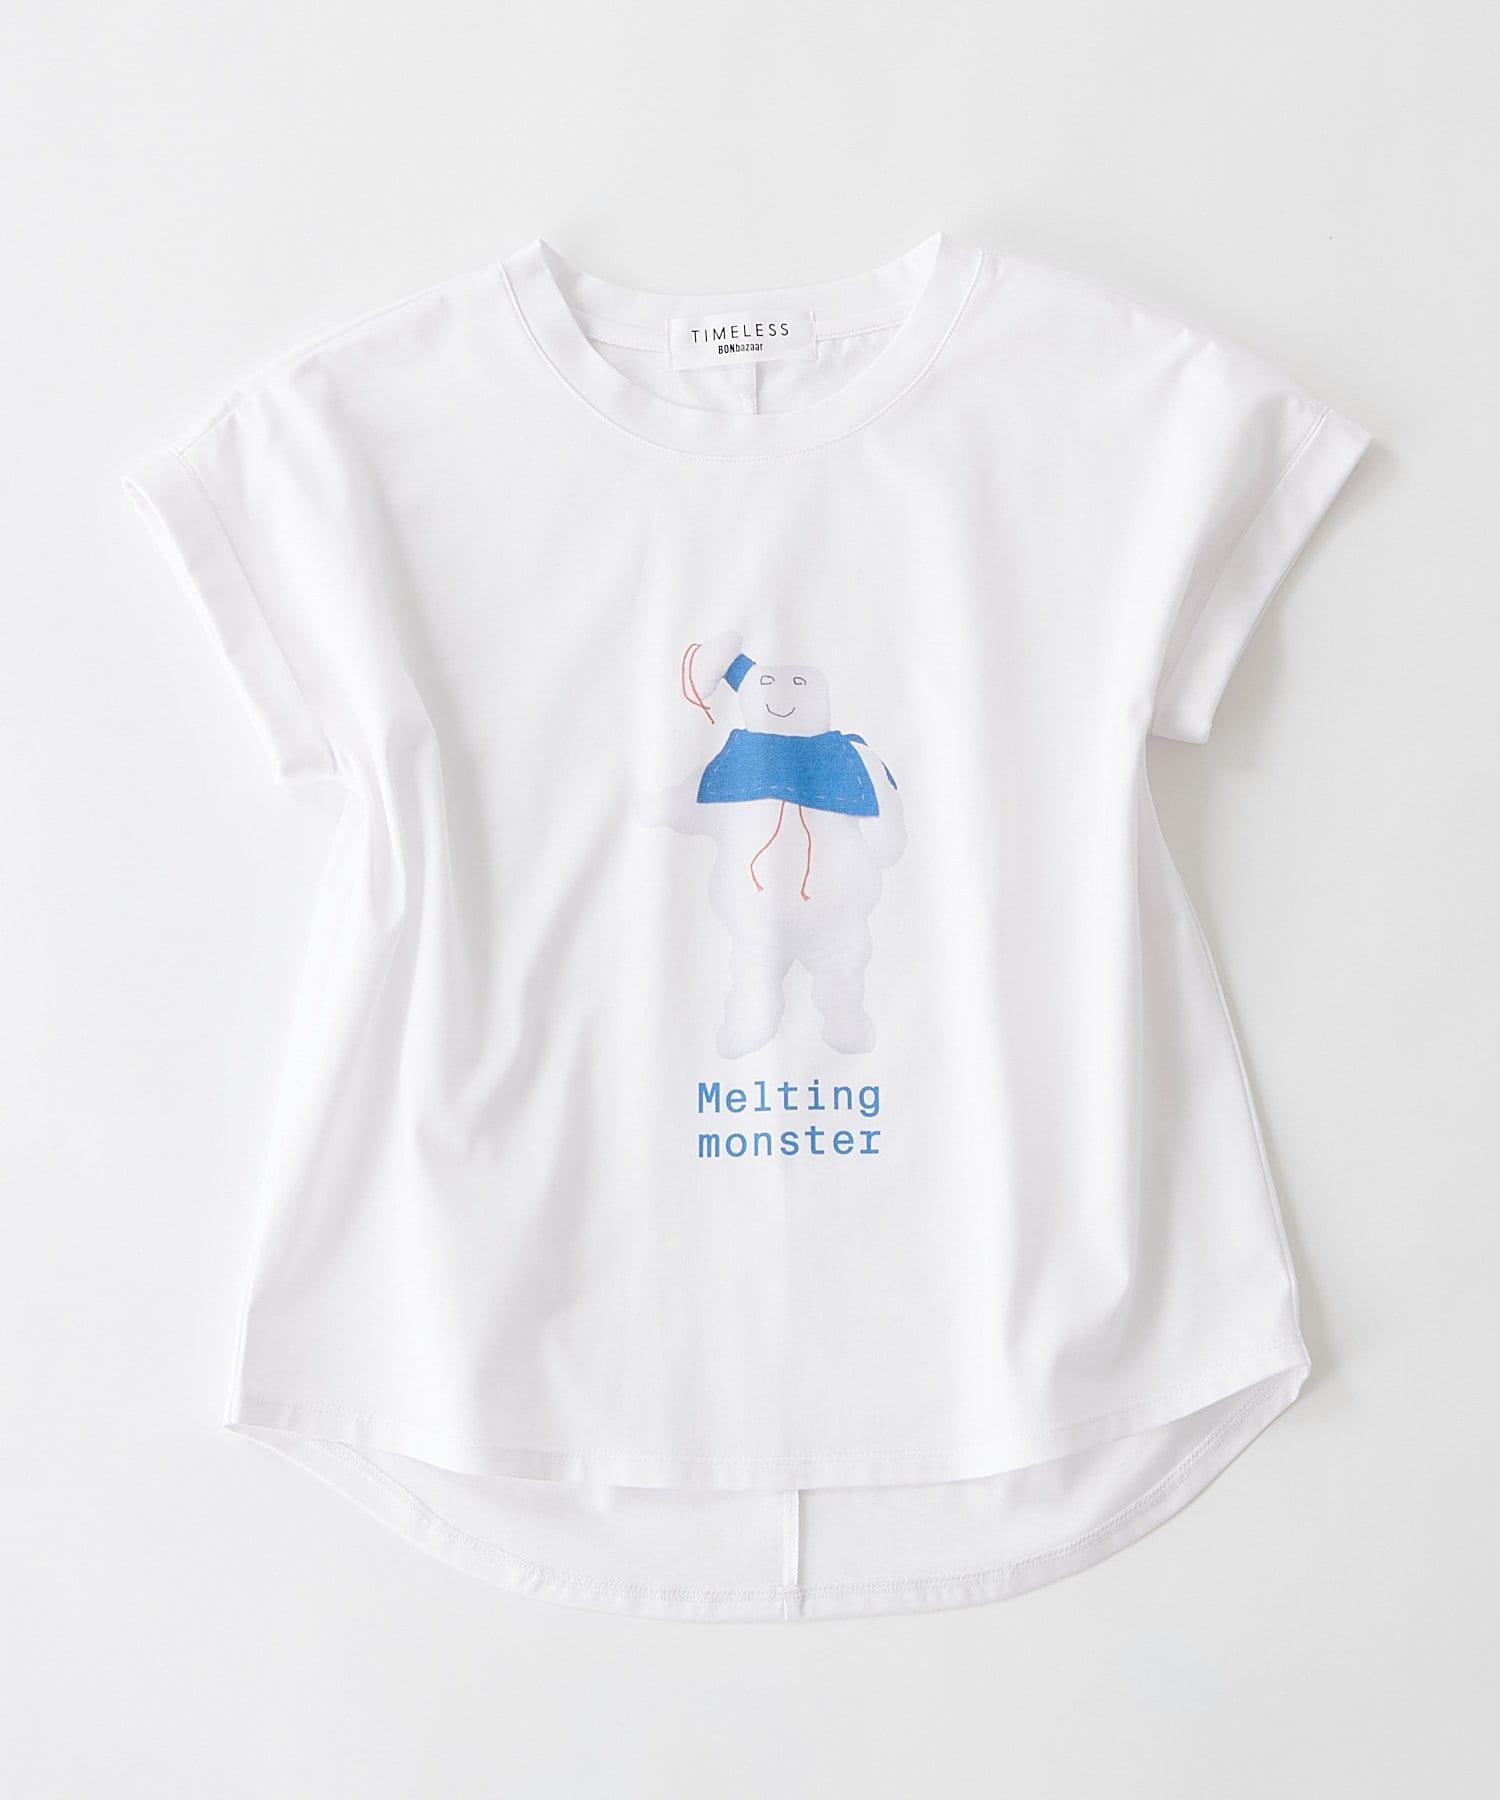 BONbazaar(ボンバザール) レディース 《長谷川 有里's キャラクター》Tシャツ Melting Monster ホワイト